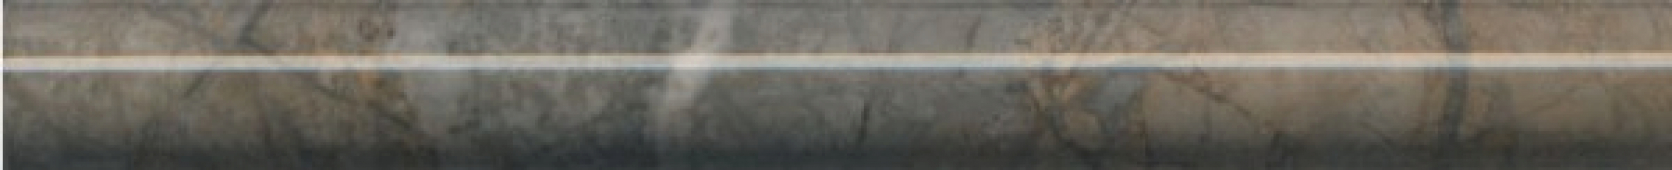 SPB007R Театро коричневый обрезной 25*2.5 бордюр